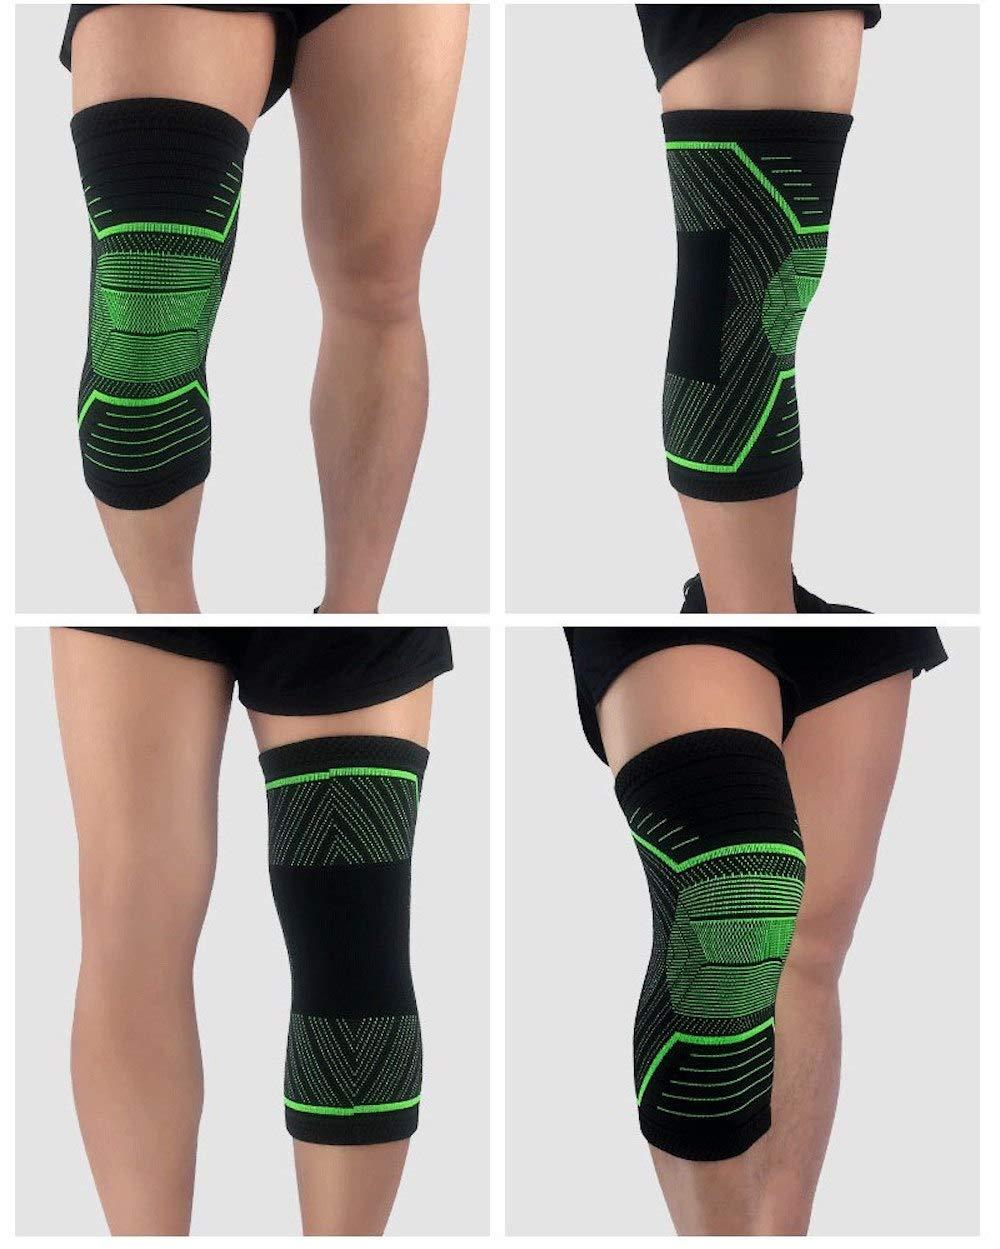 Amazon.com: LIA Knee Brace - 1 Piece Basketball Knee Pads ...